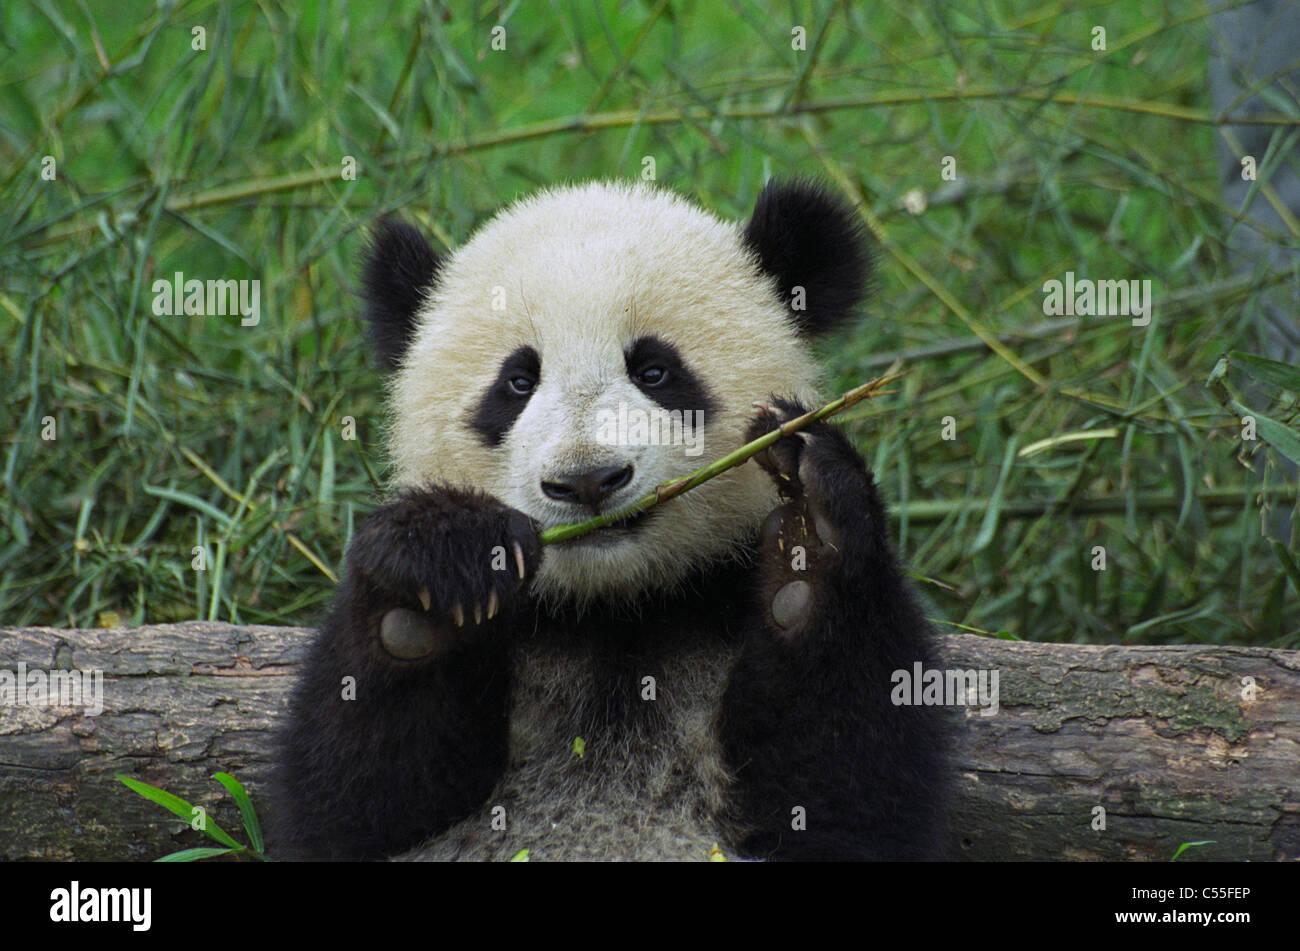 Giant Panda Cub Essen Bambus China Stockfoto Bild 37615950 Alamy